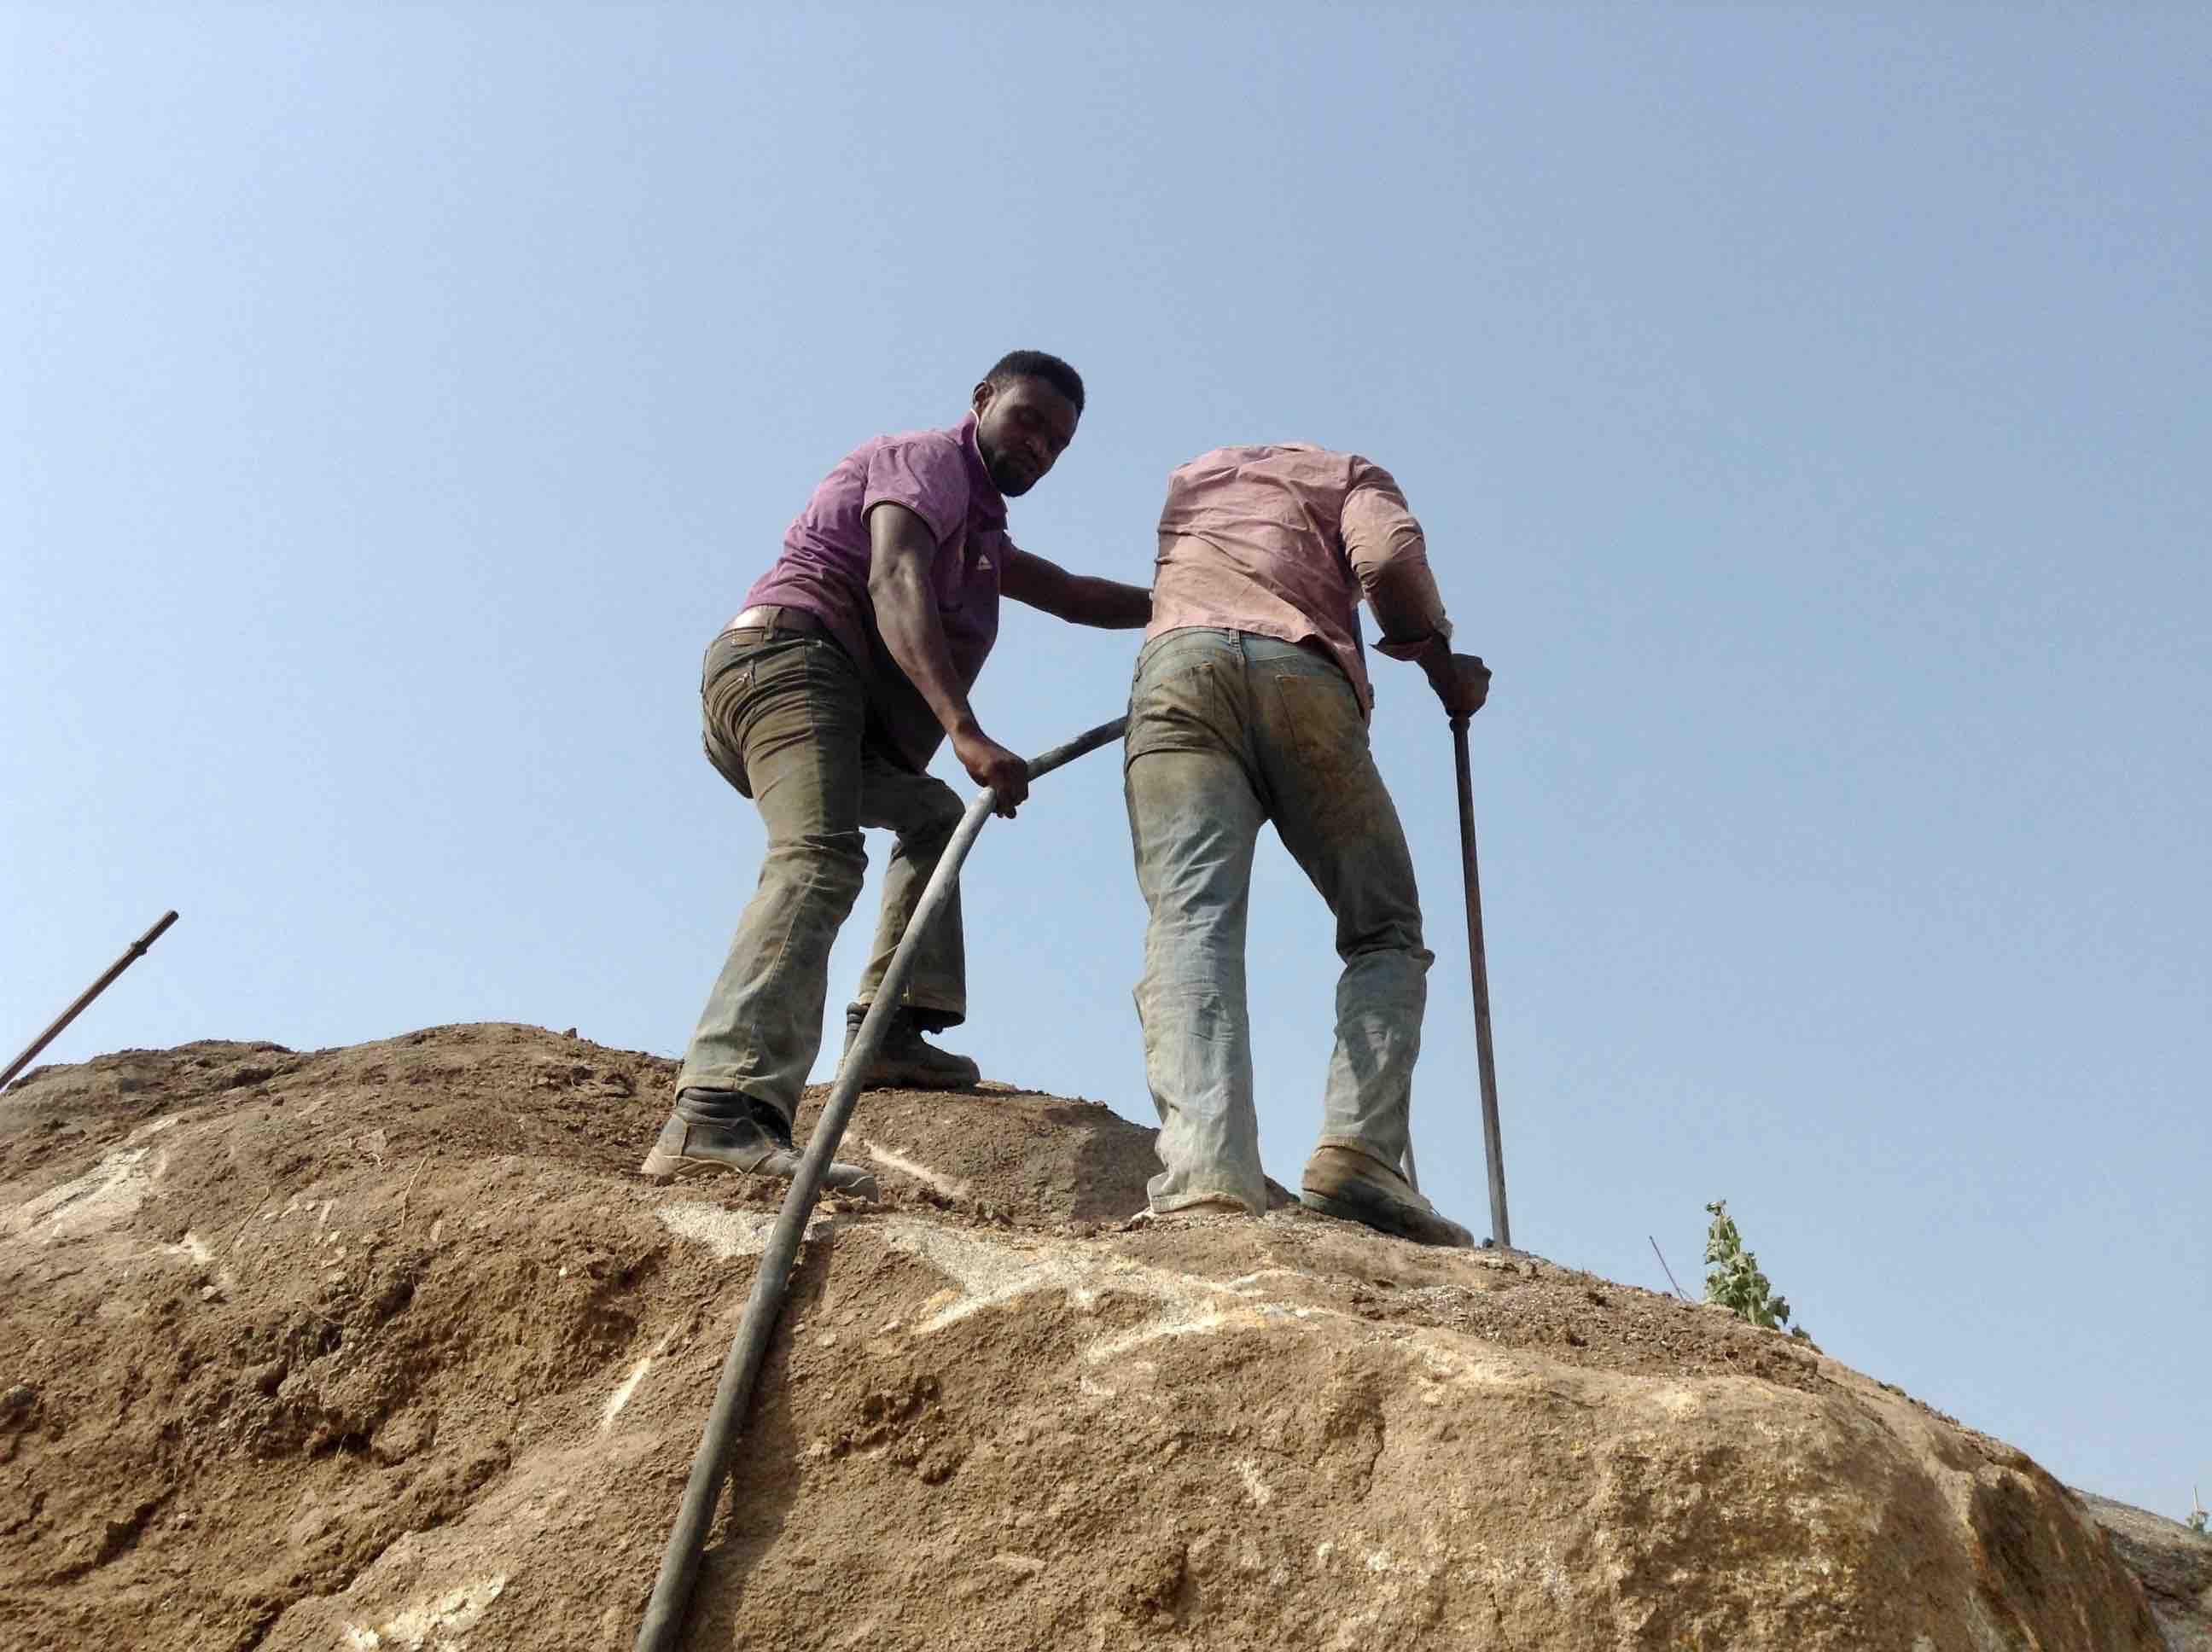 Busting Rocks, Ushafa Village, FCT, Abuja, Nigeria. #JujuFilms